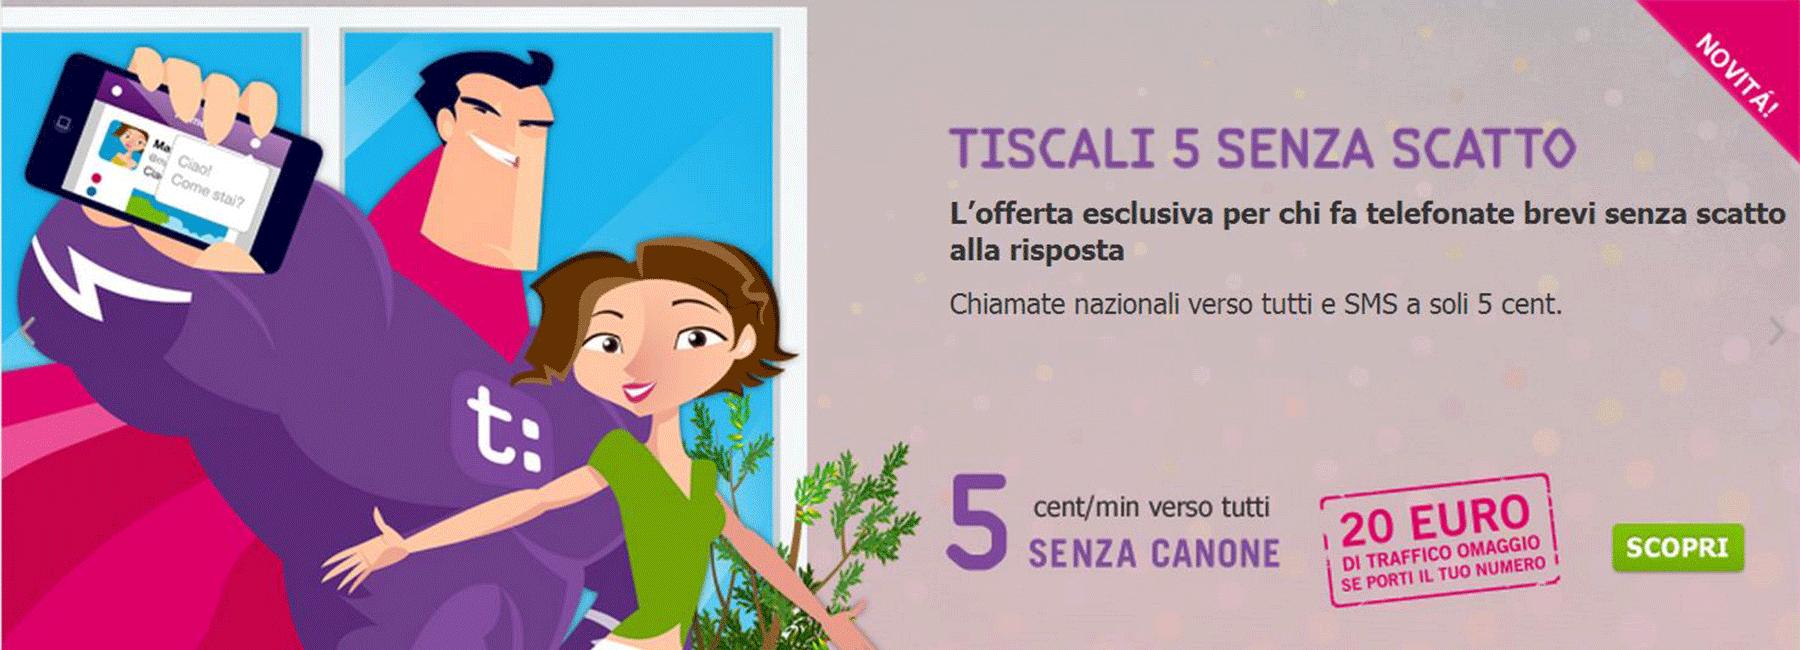 Tiscali, Il centro FB, Jesi